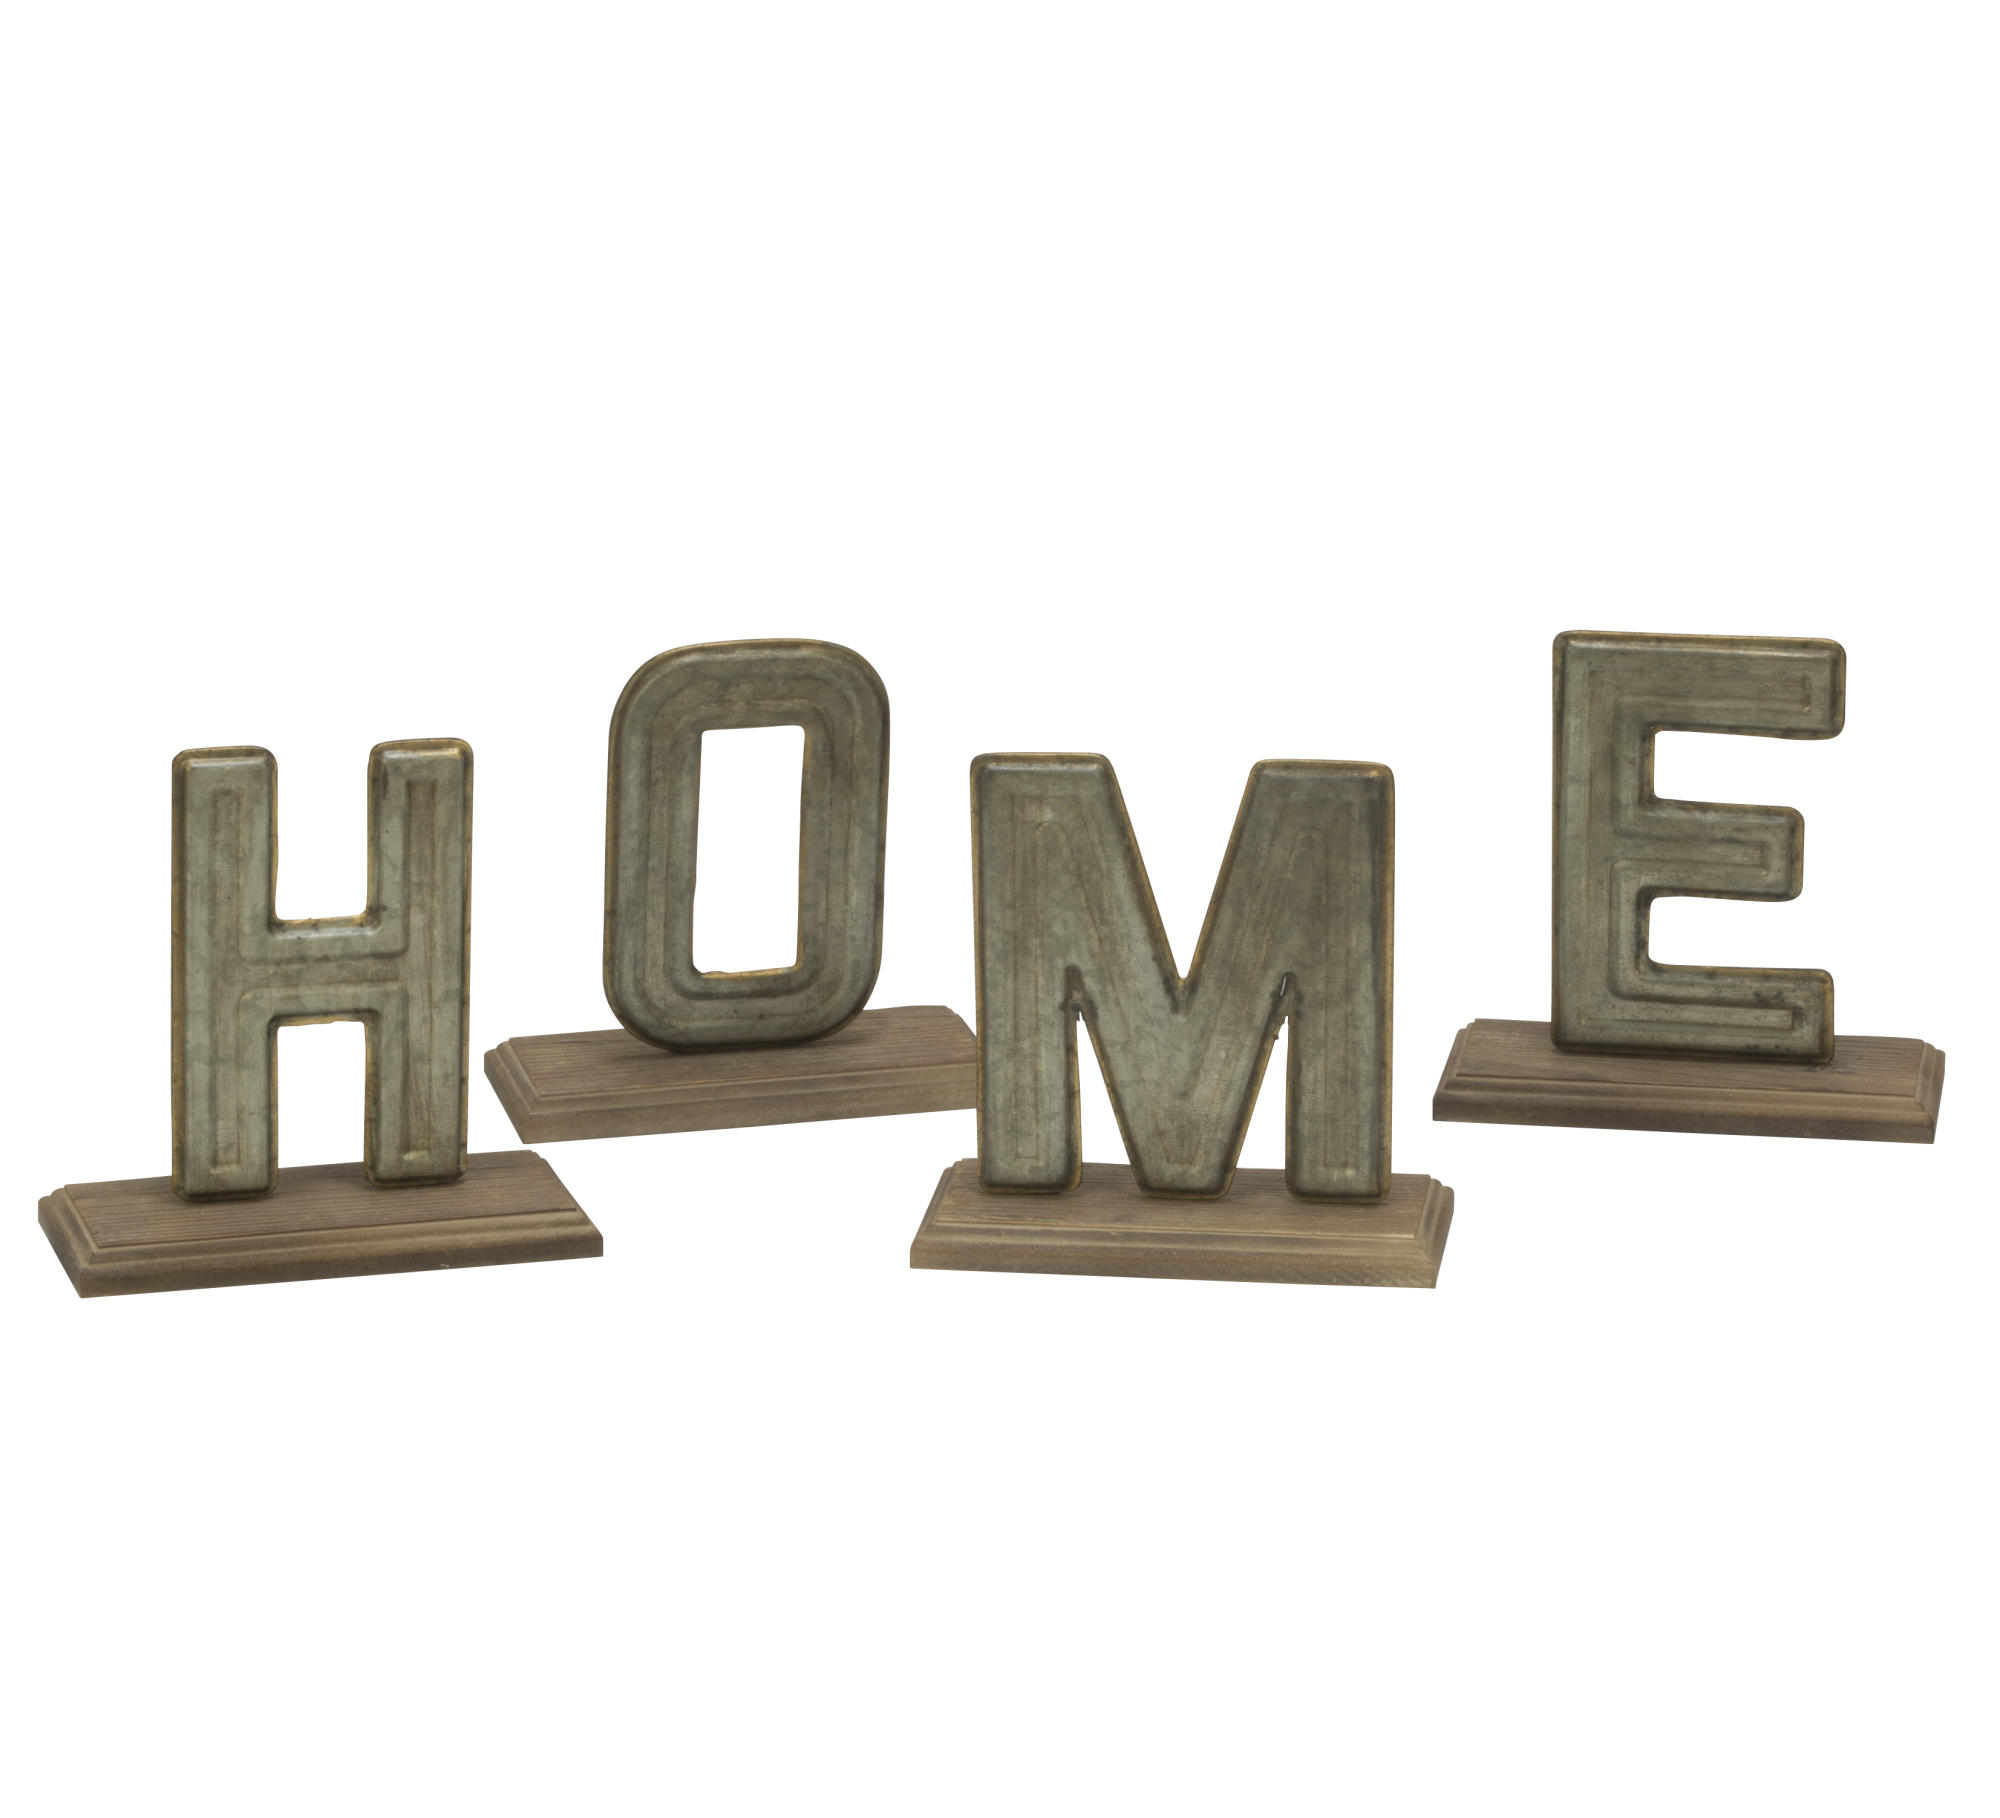 Marvelous Rustic Home Letters Tripar International Inc Creativecarmelina Interior Chair Design Creativecarmelinacom